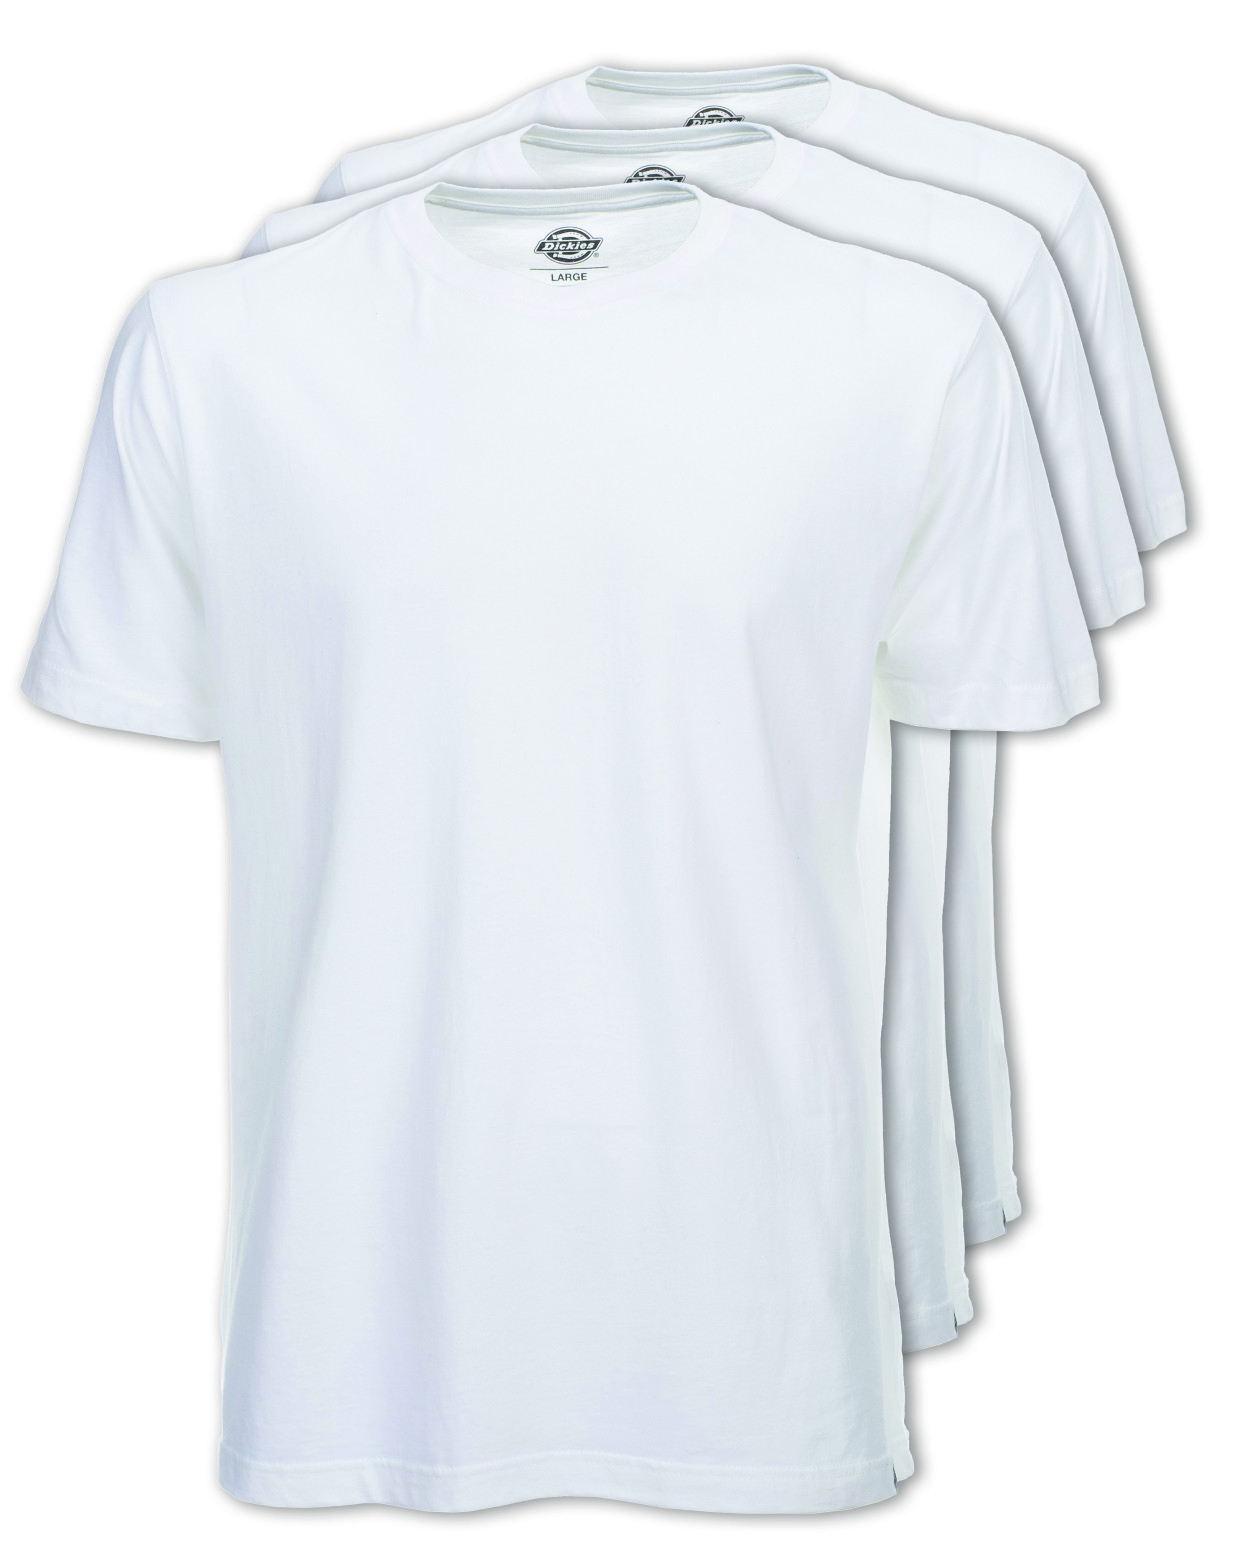 Dickies Herren 3er Pack T-Shirts basic DICKIES T-SHIRT POCKET